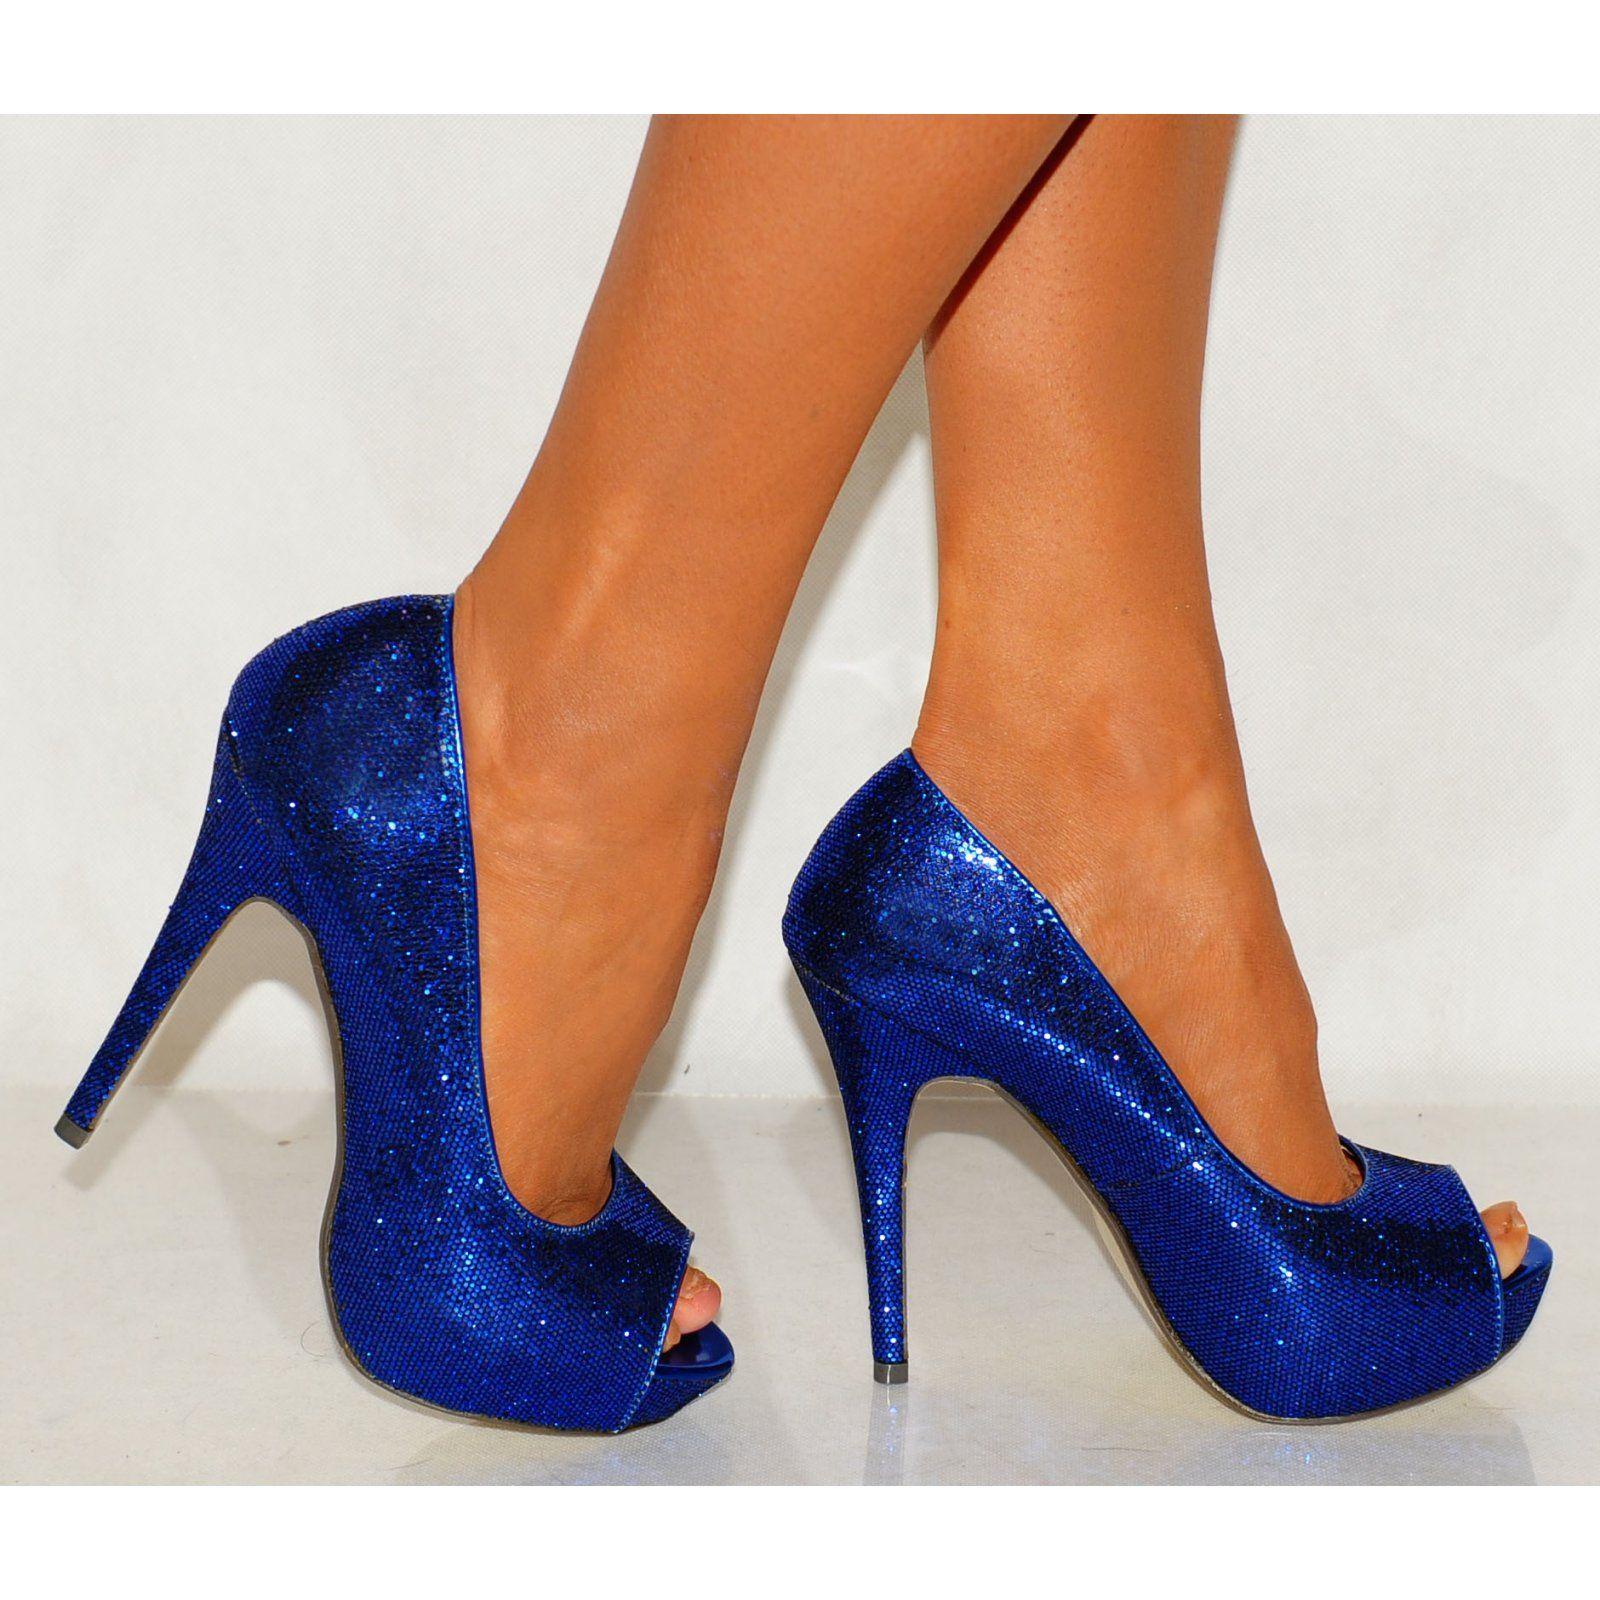 blue high heels | shoes! | Pinterest | Sparkly heels, Blue high ...